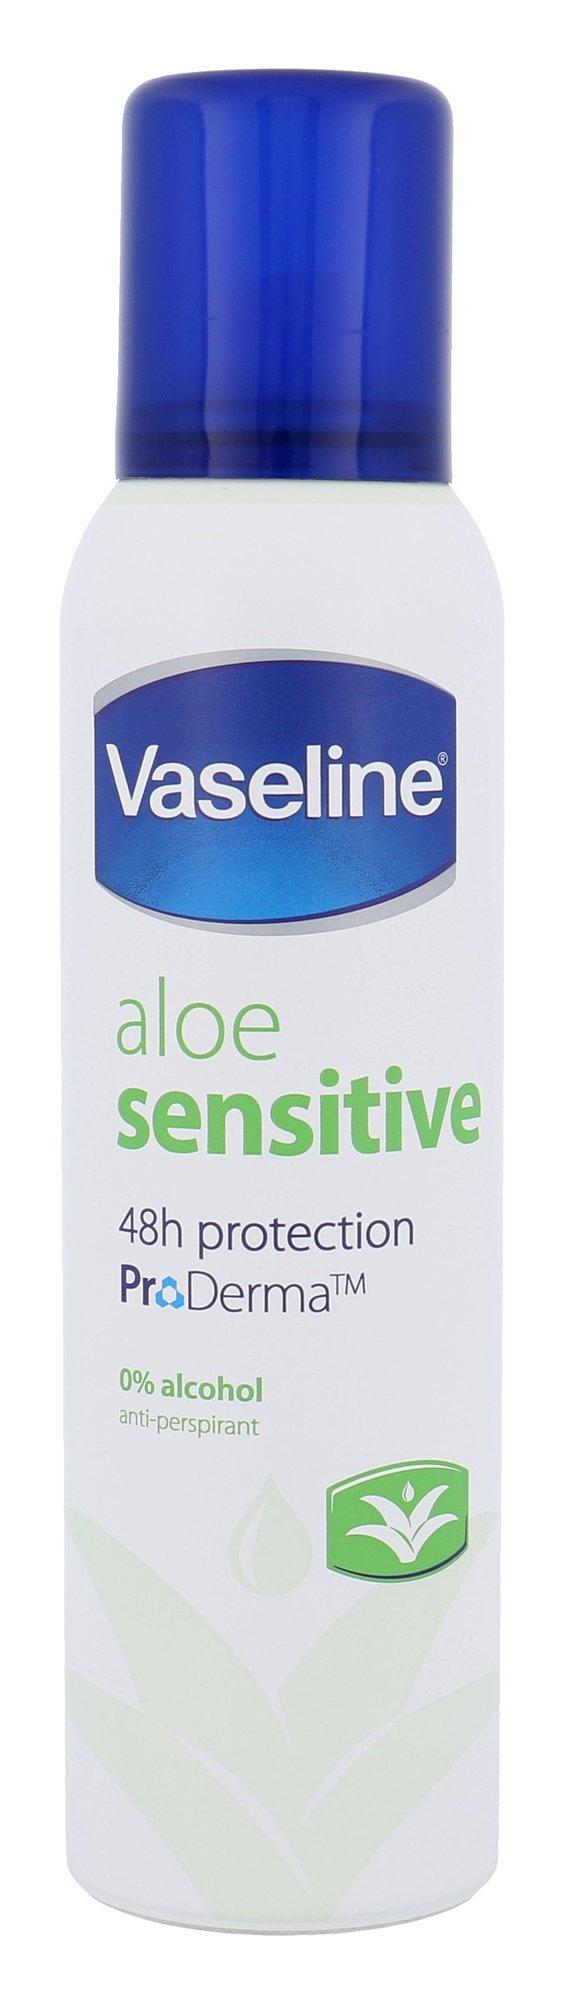 Vaseline Aloe Sensitive Cosmetic 150ml